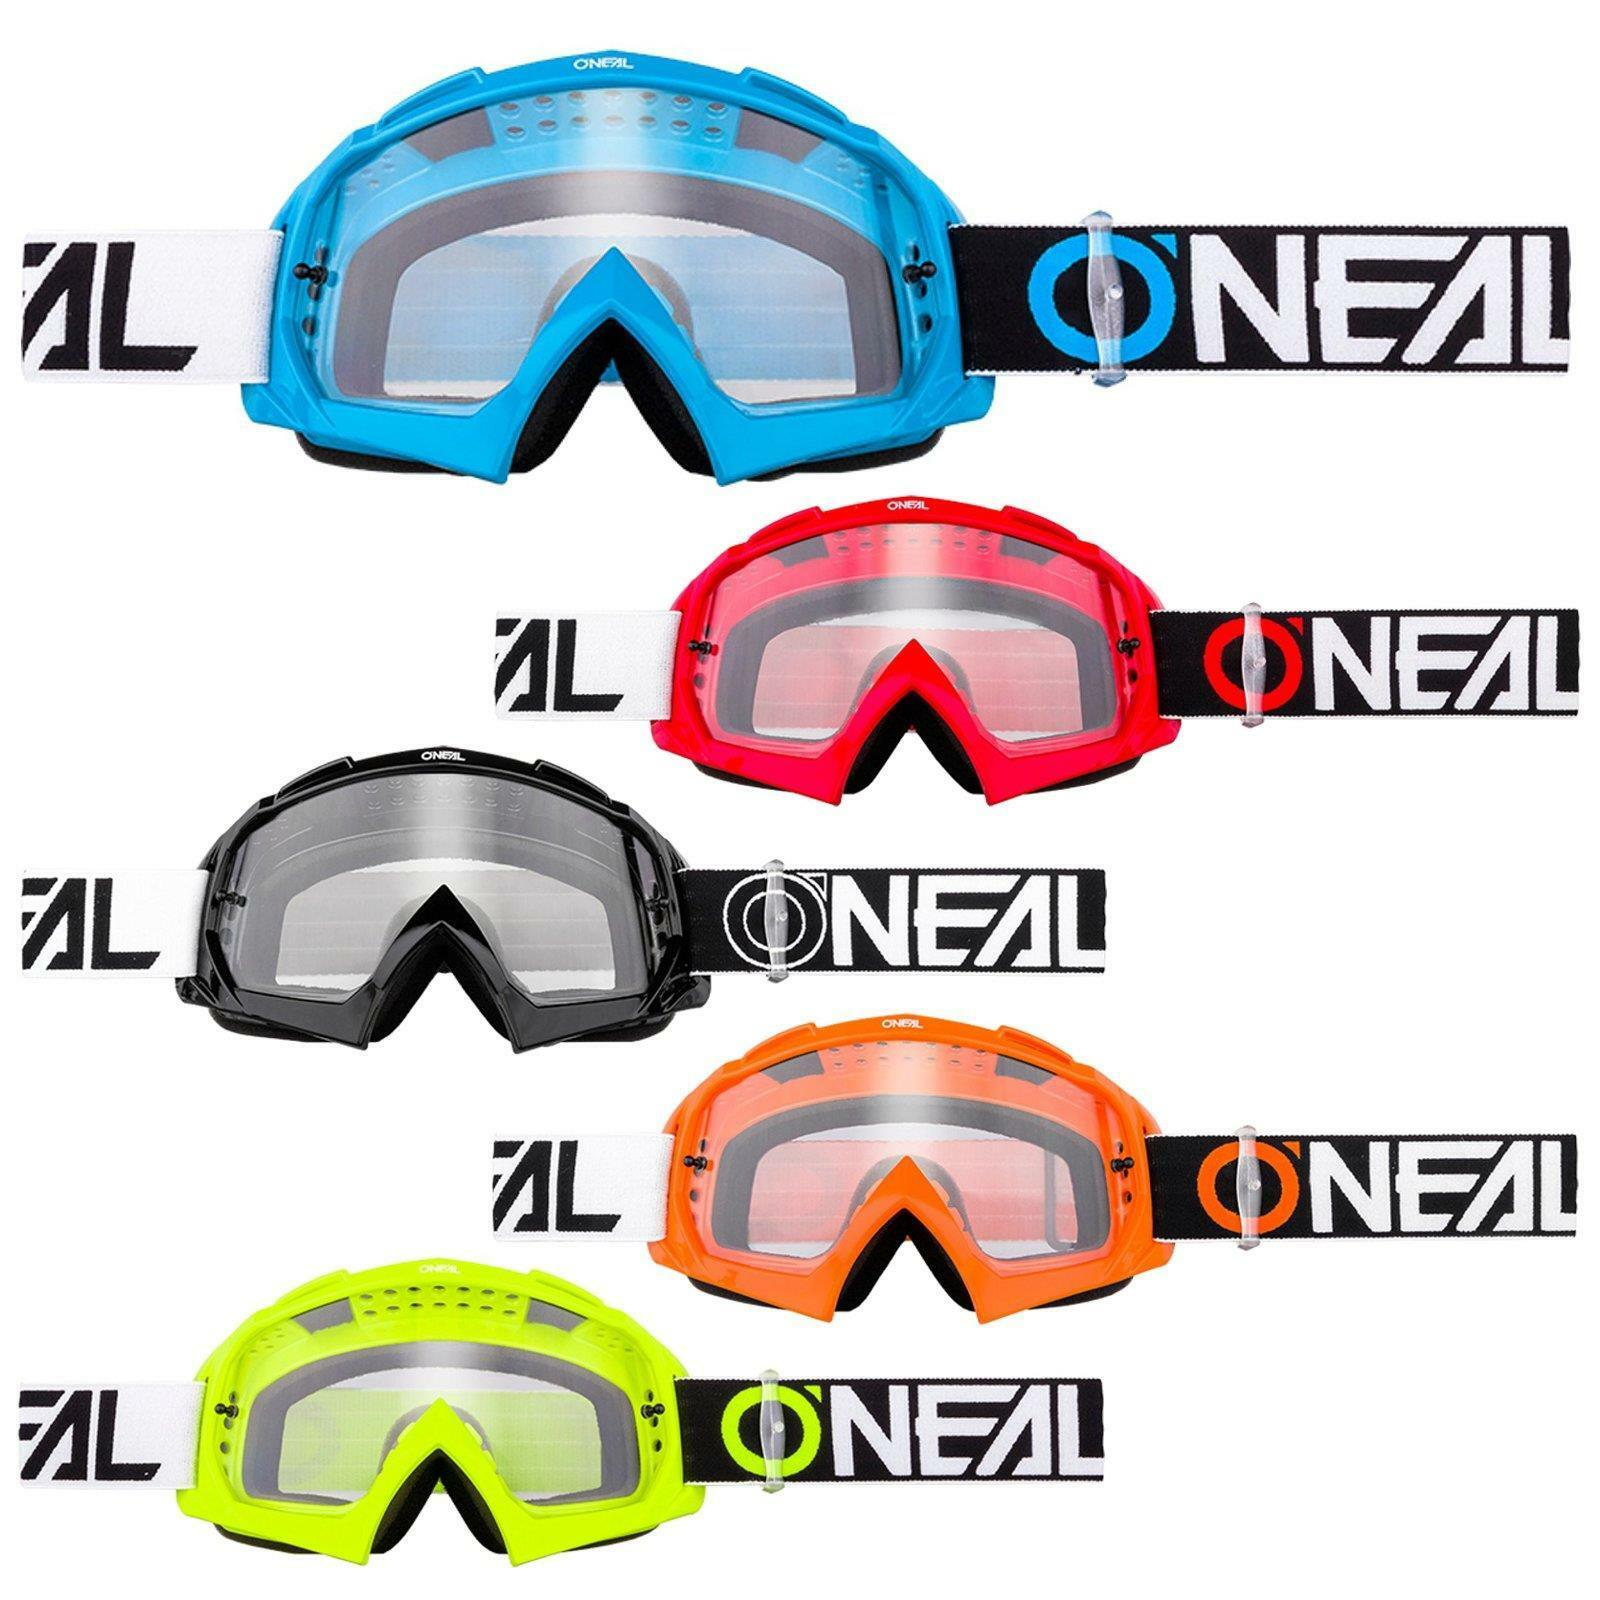 ONeal B-10 Goggle Twoface MX Brille  Klar Moto Cross DH Downhill Anti-Fog MTB  shop clearance